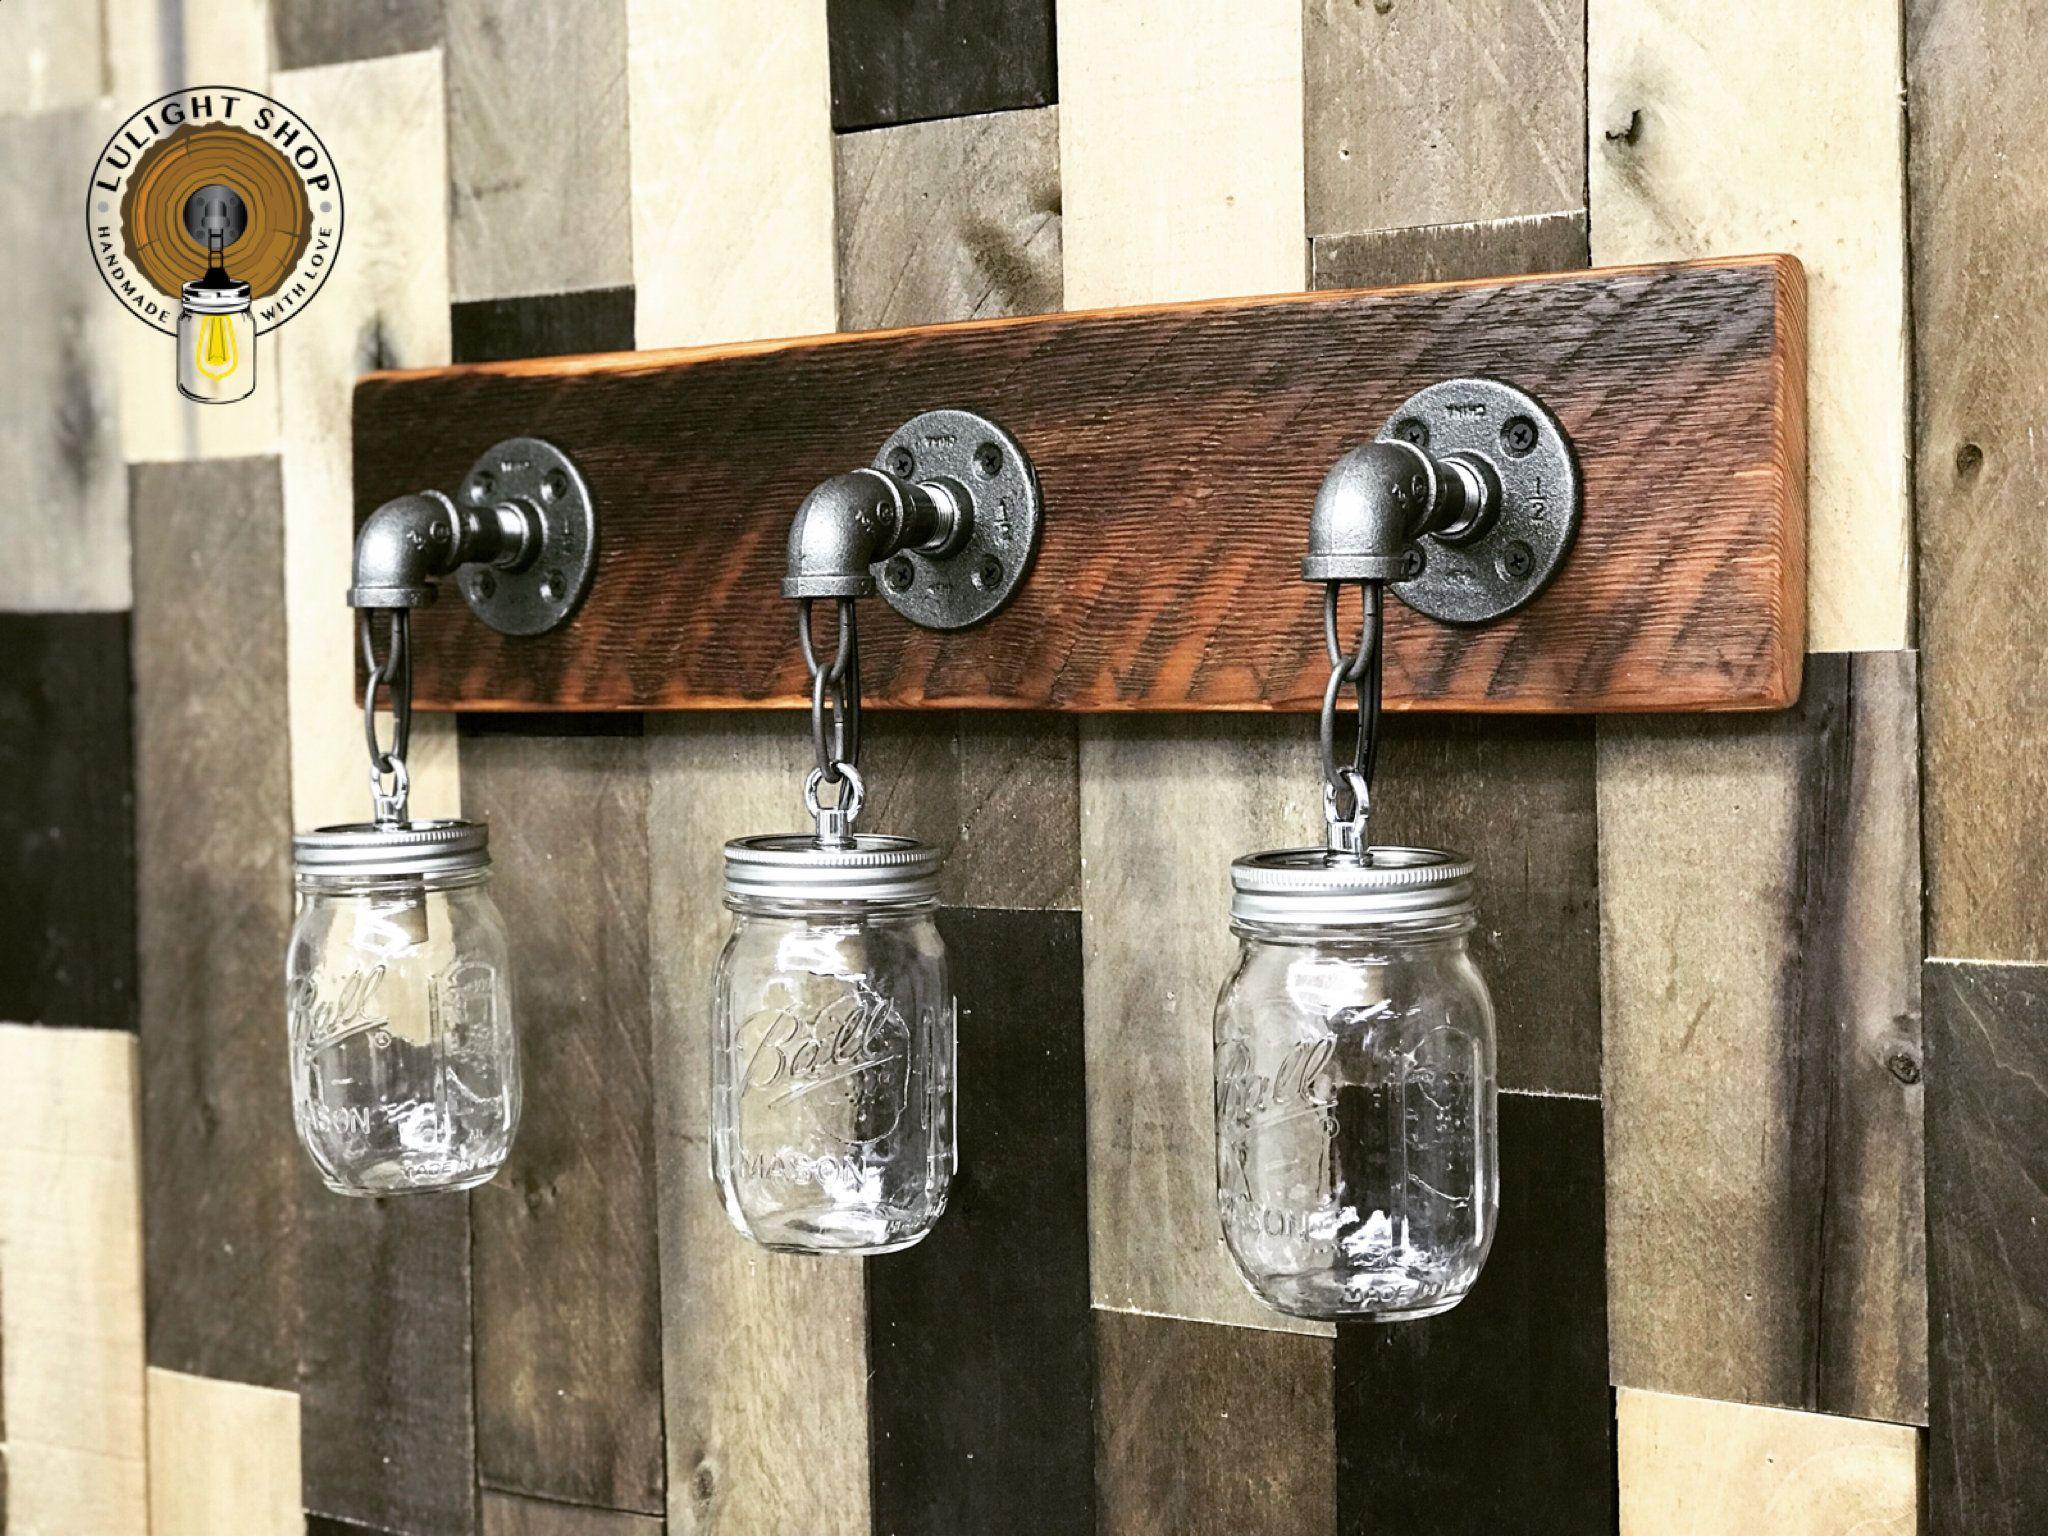 Reclaimed Wood Mason Jar Light Fixture Bathroom Lights 3 Lights Fixture Vanity Lights Wall Li Mason Jar Light Fixture Rustic Light Fixtures Rustic Lighting